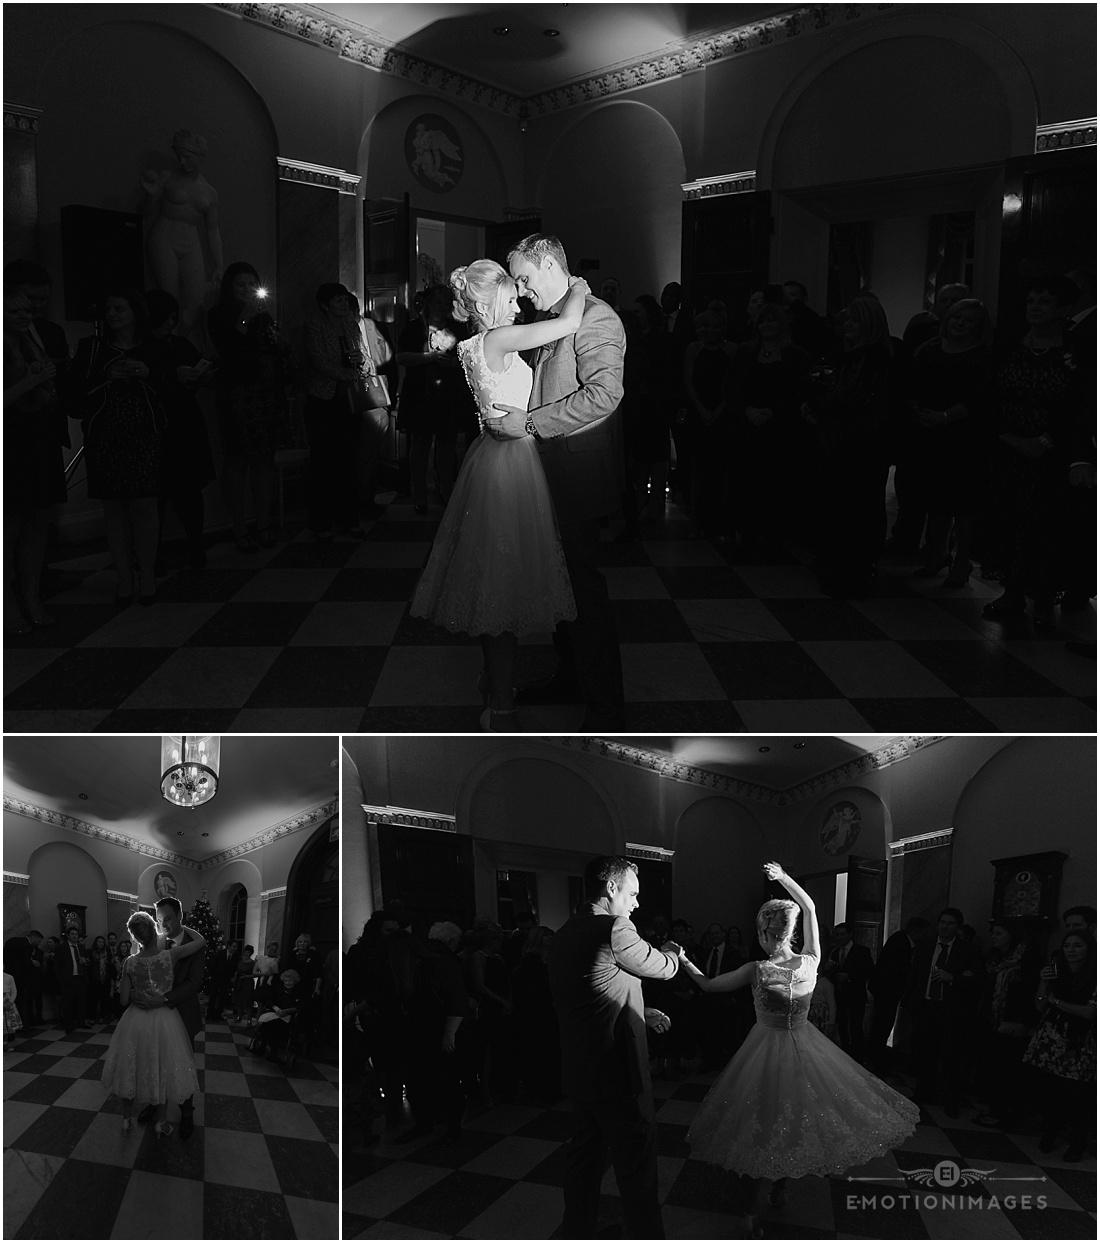 Hylands_House_wedding_photography_e-motion_images_016.JPG